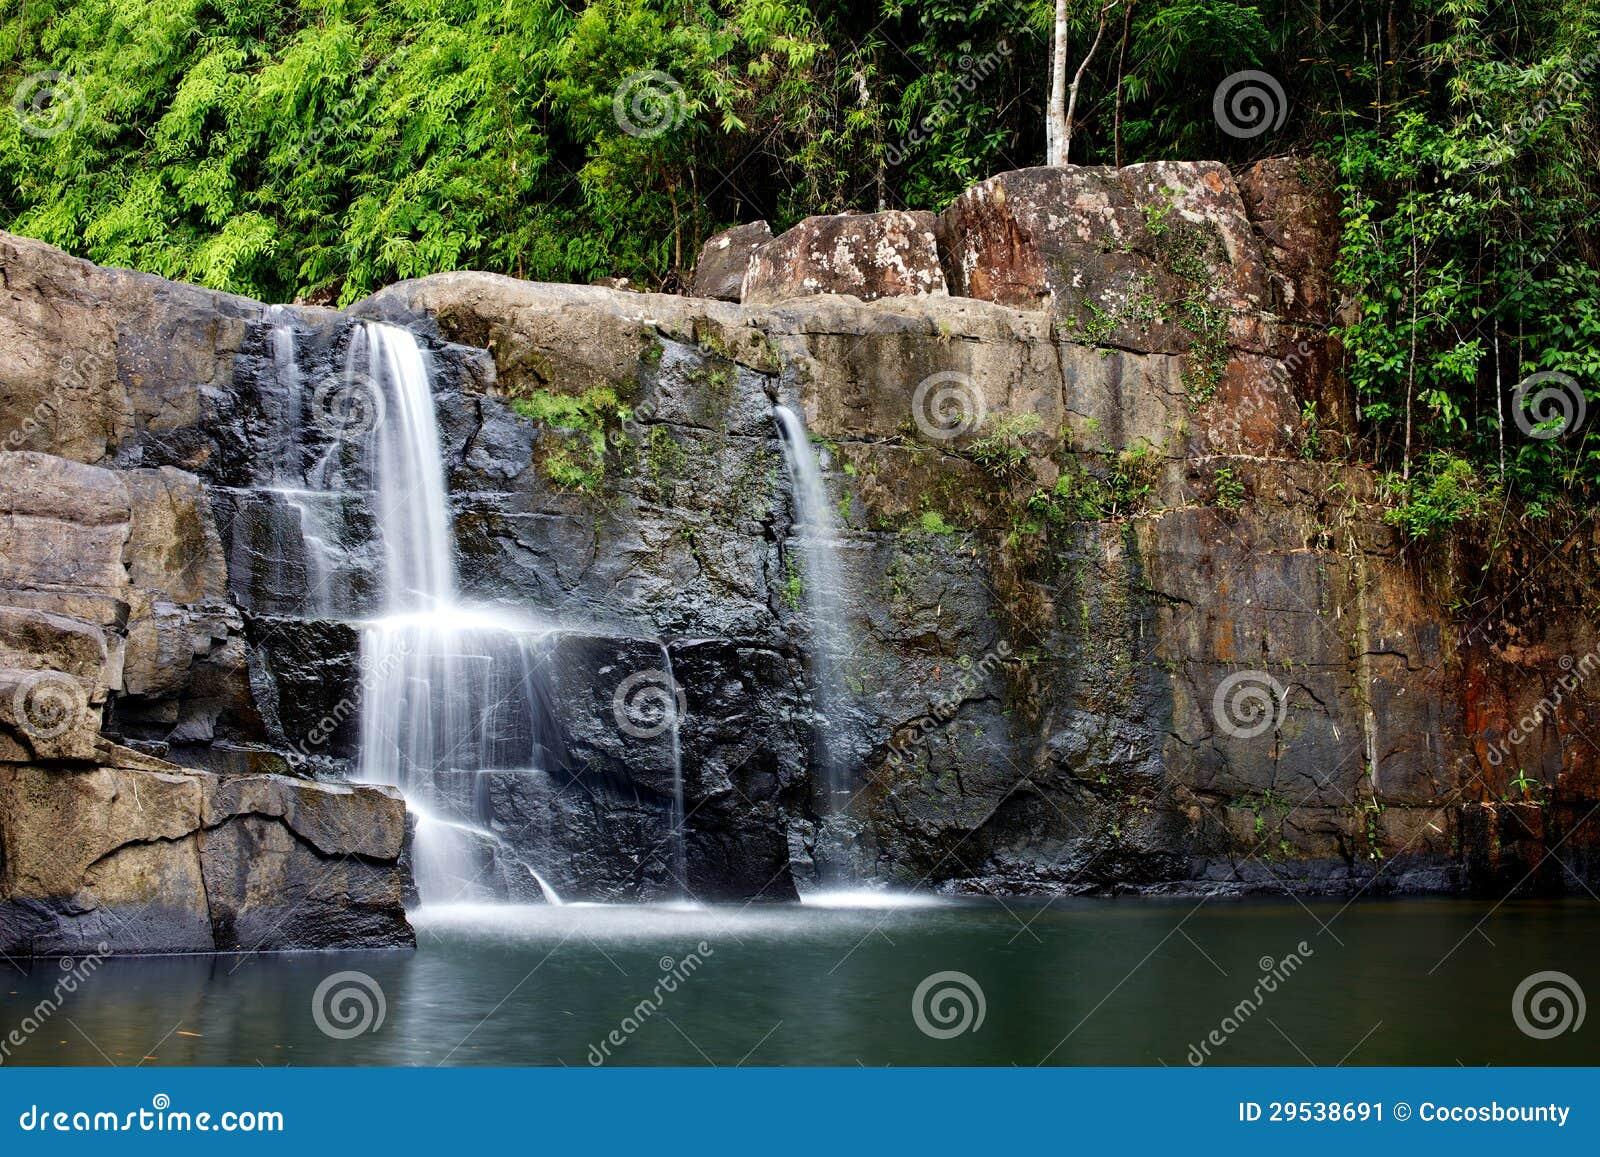 Cachoeira na selva, Tailândia